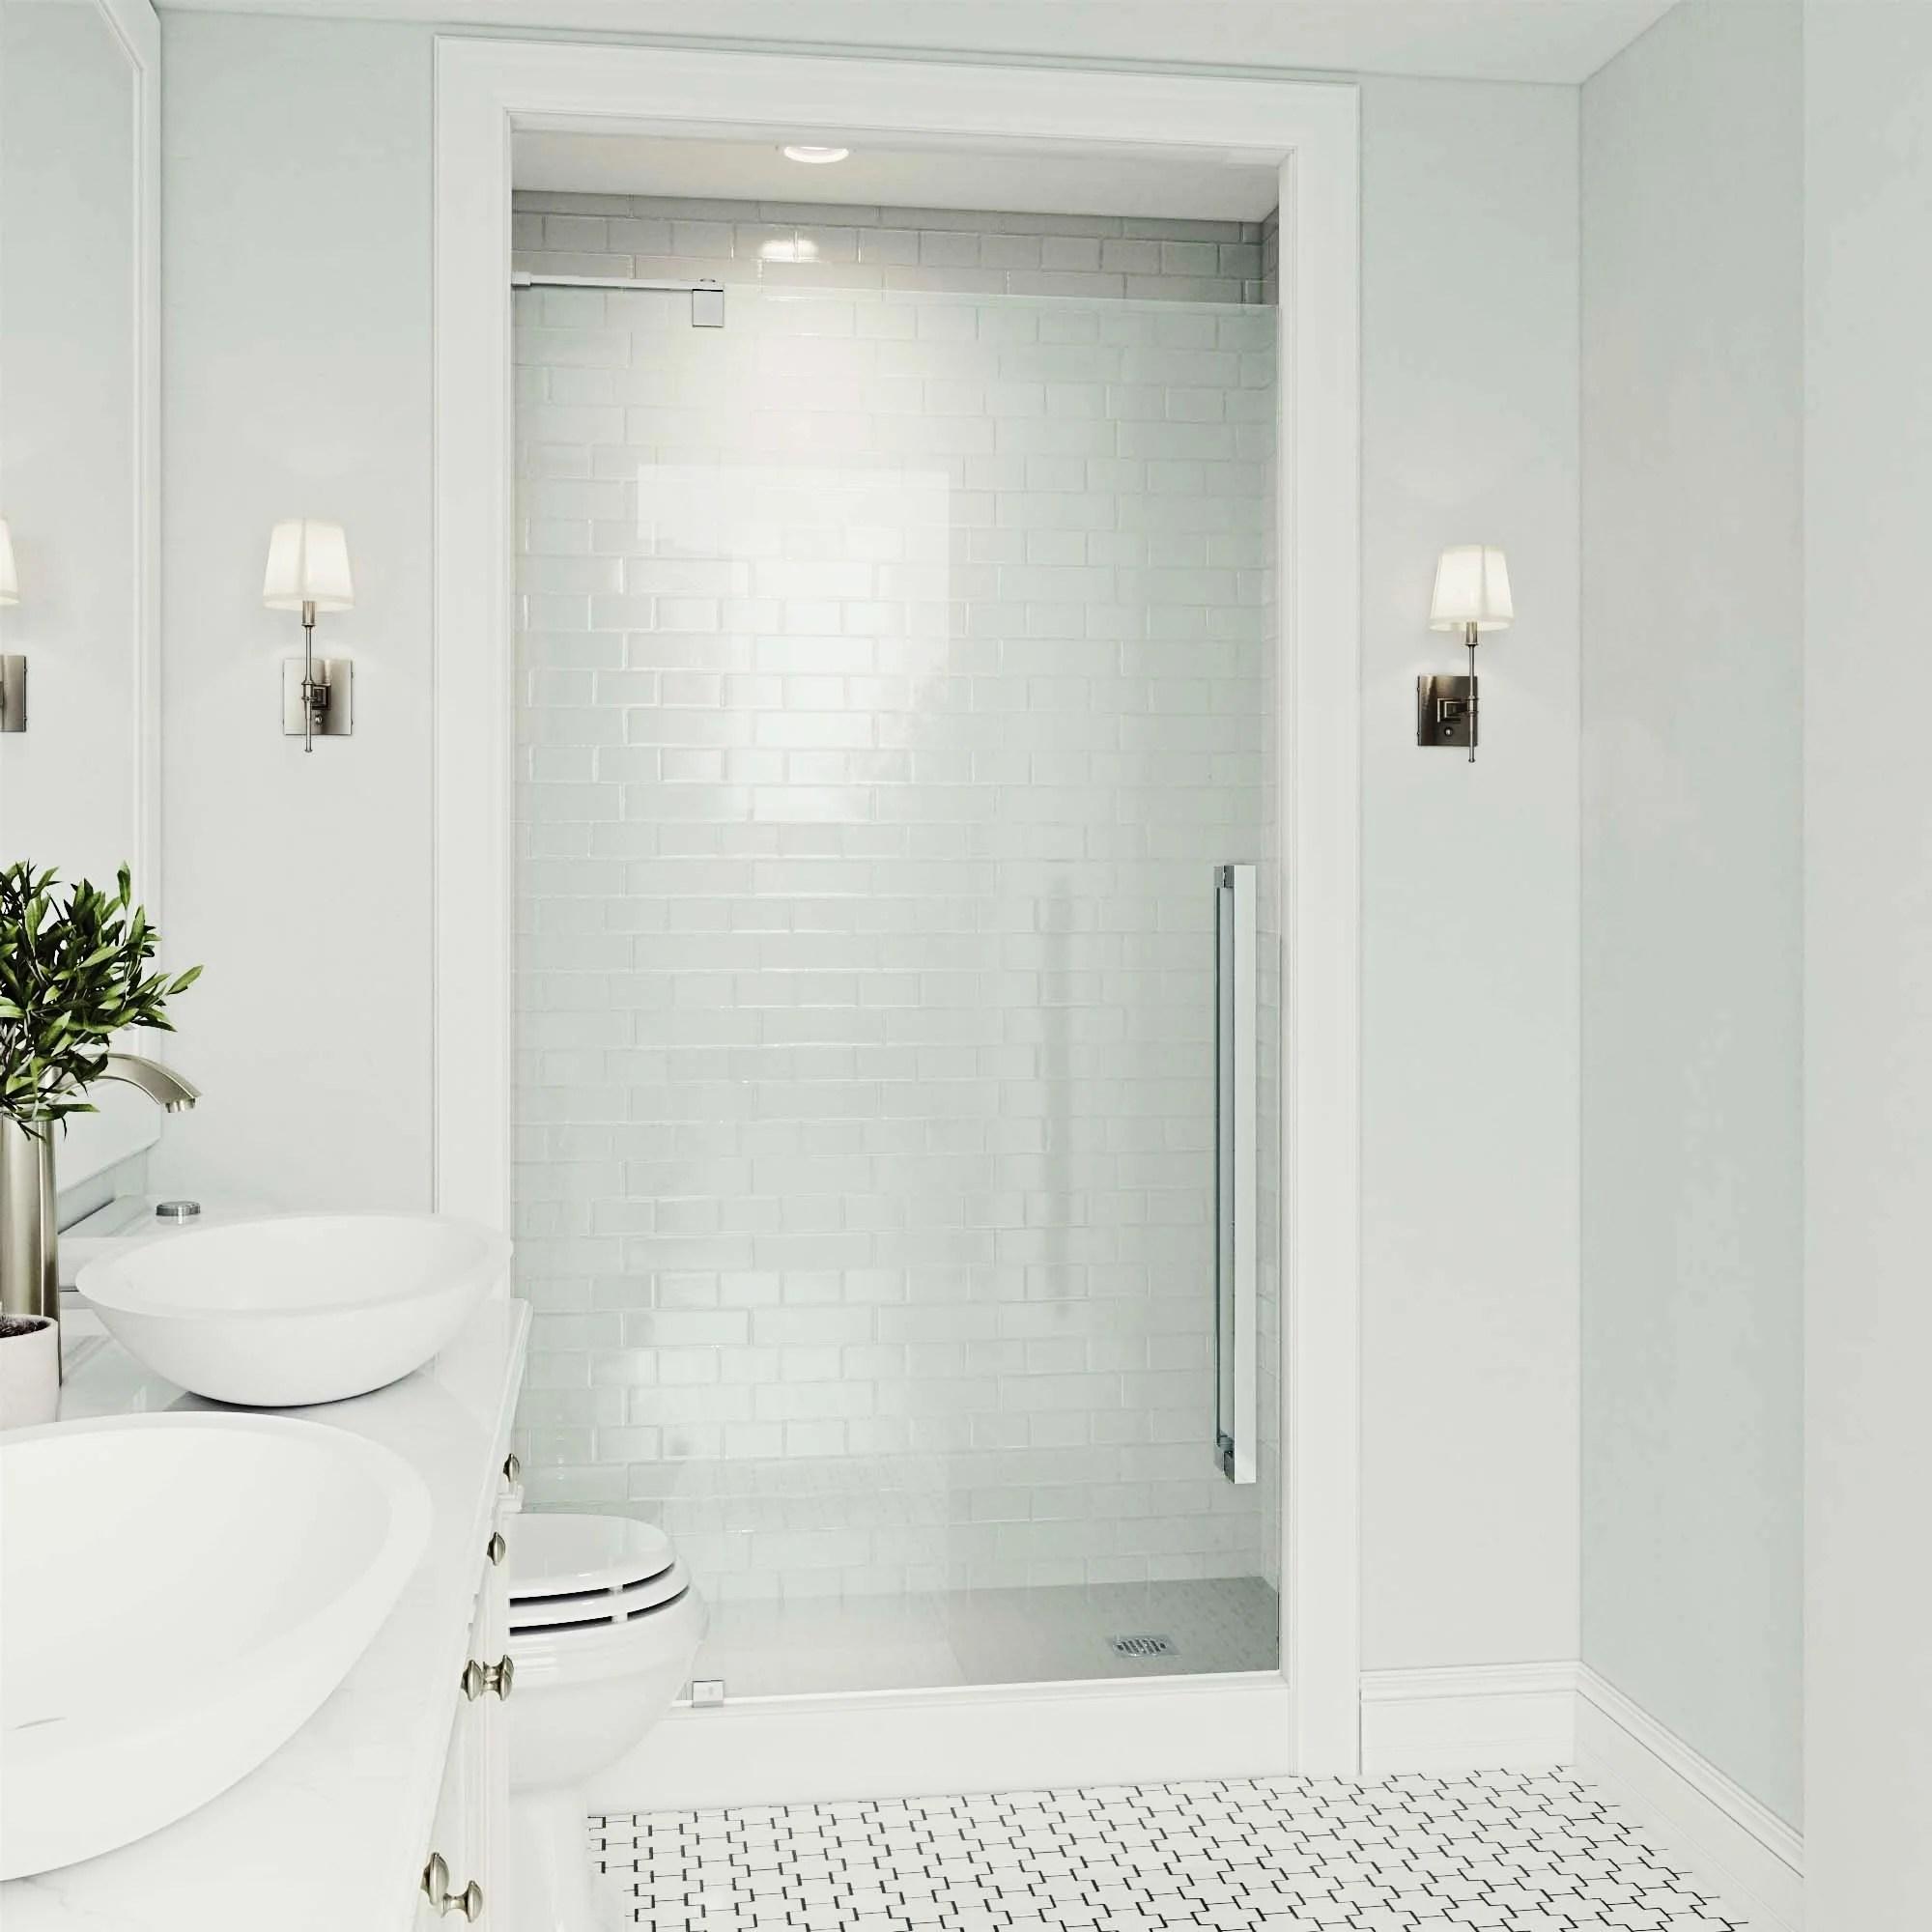 Vigo Cameo Clear 42 Inch Adjustable Frameless Pivot Shower Door